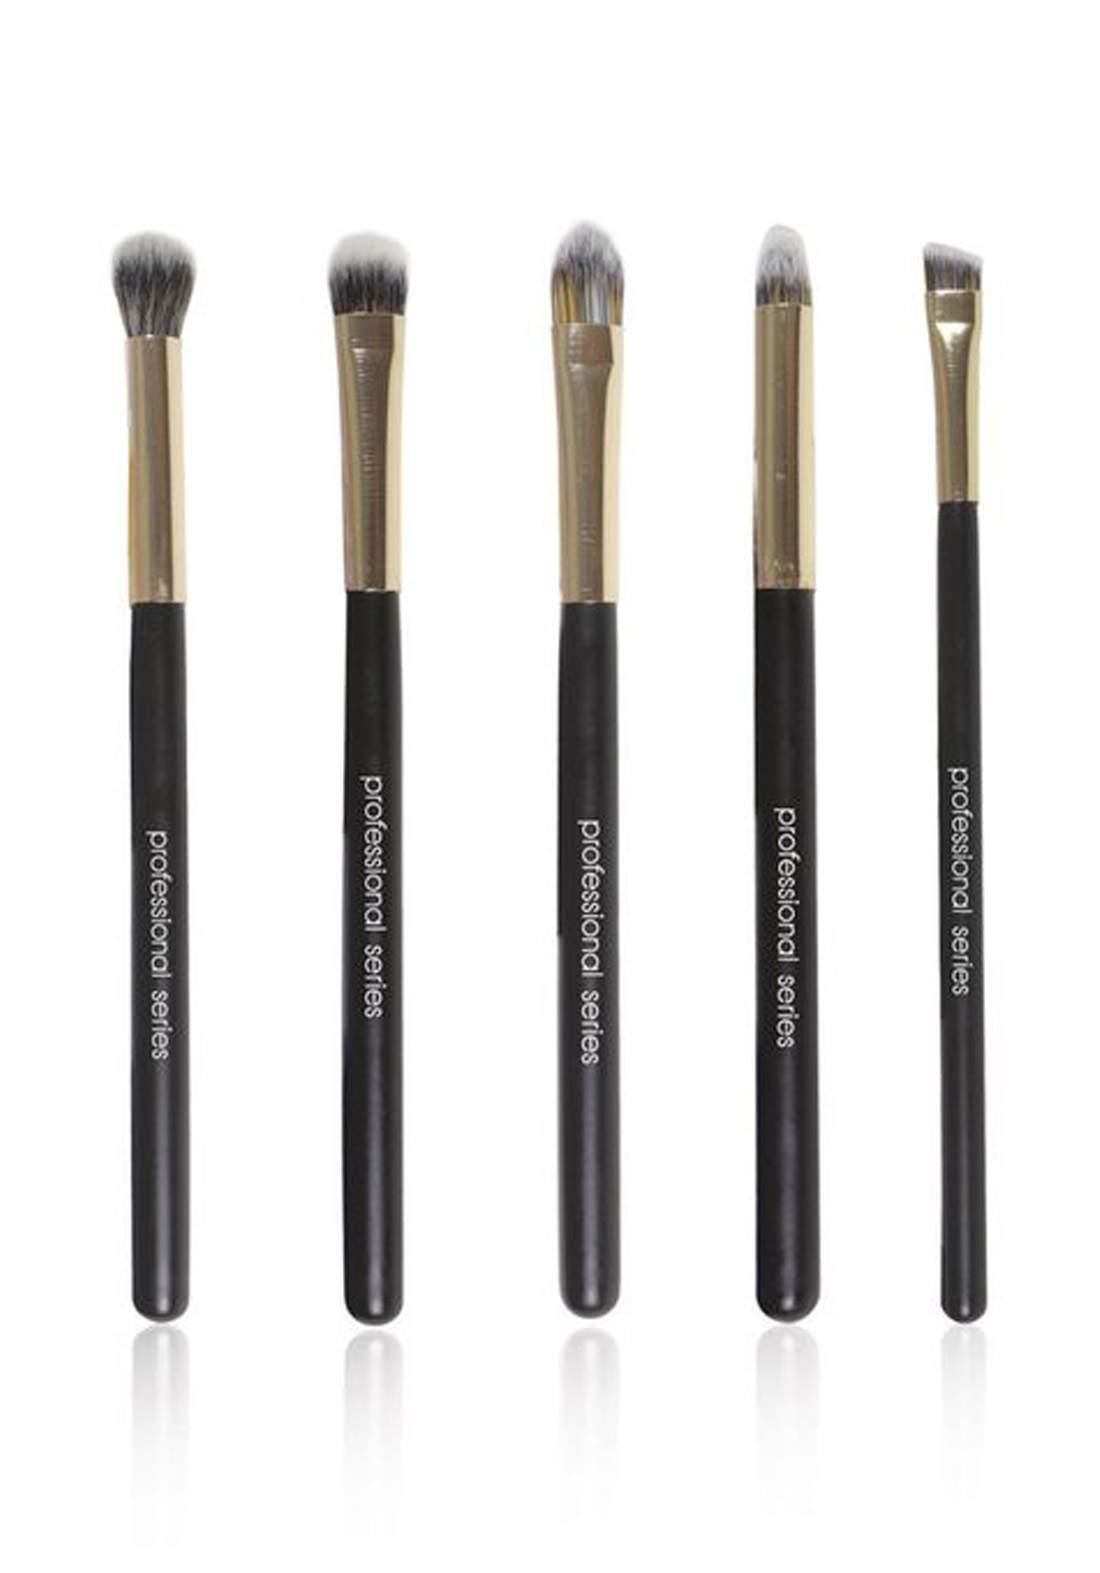 Nastia set12 Eye Makeup Brush Set 5Pcs سيت فرش مكياج